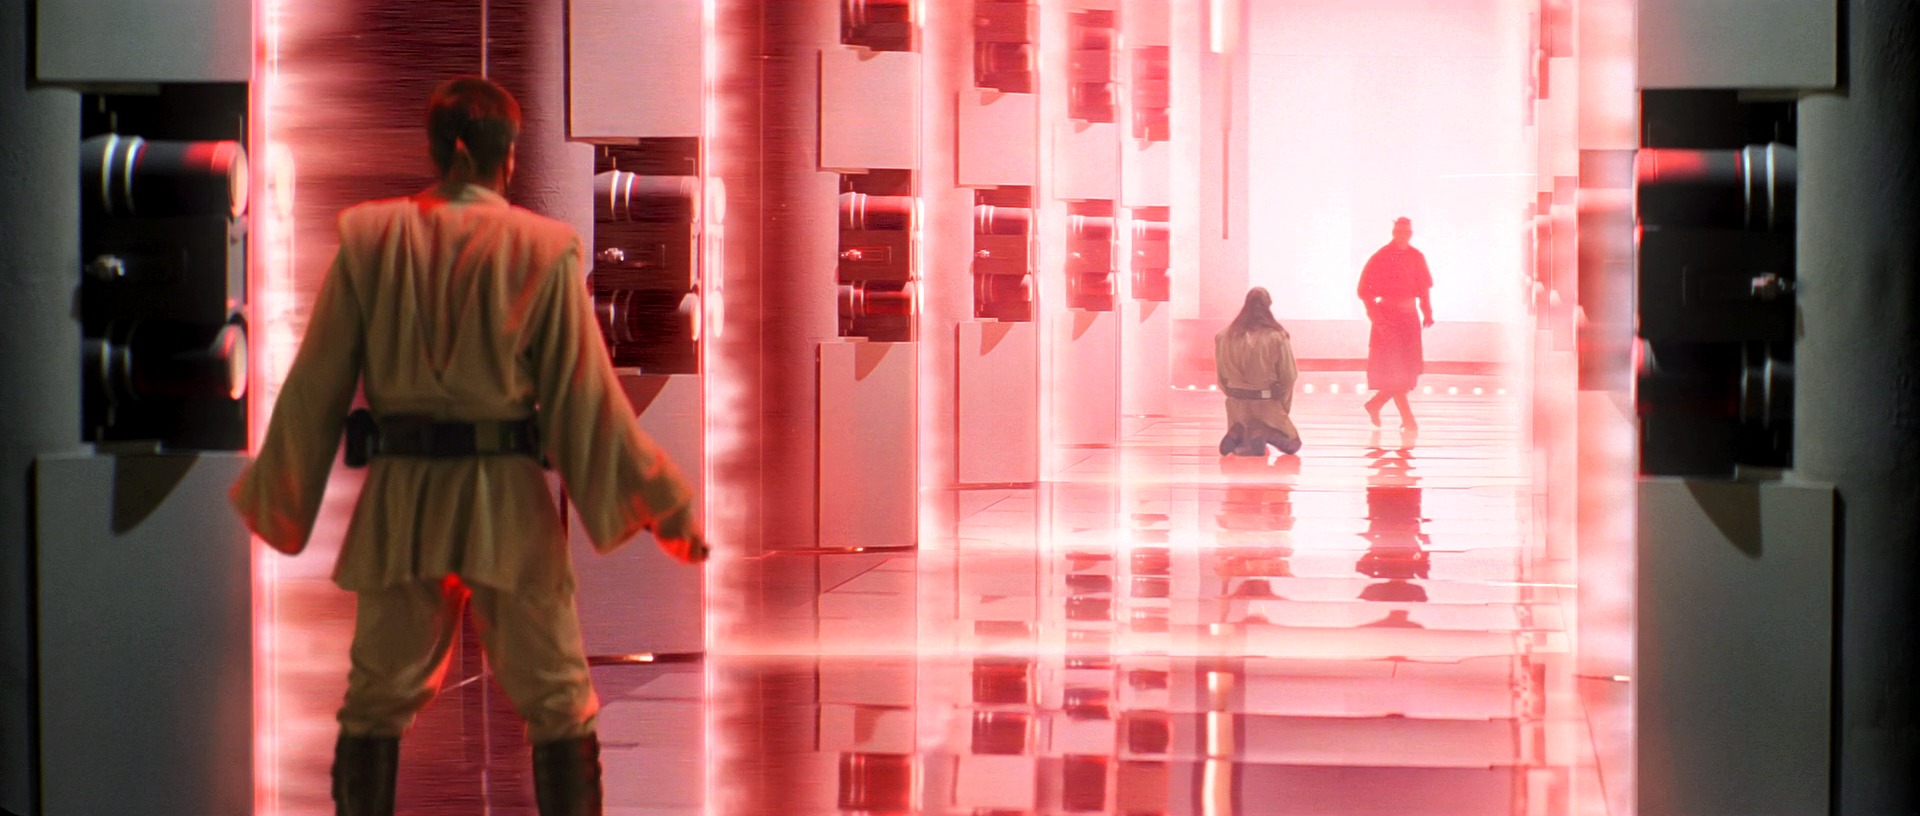 Image result for Phantom menace shield doors